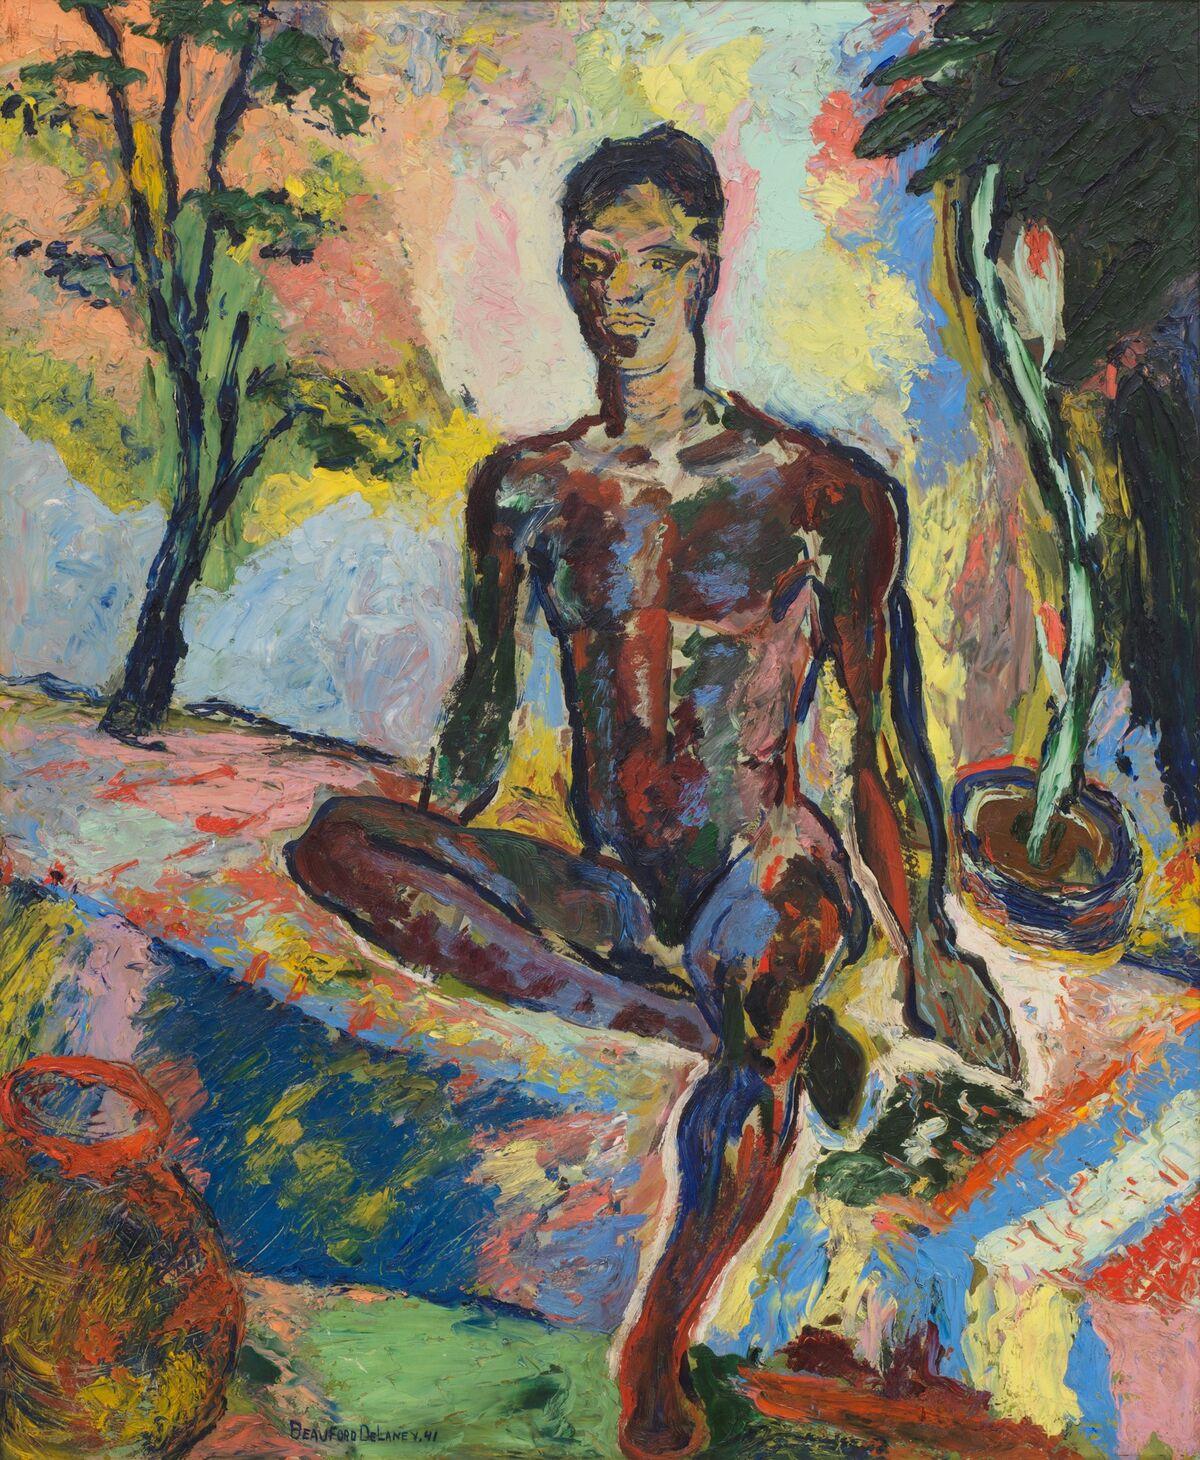 Beauford Delaney,  Dark Rapture (James Baldwin),  1941. Courtesy of Michael Rosenfeld Gallery LLC, New York, NY and David Zwirner.